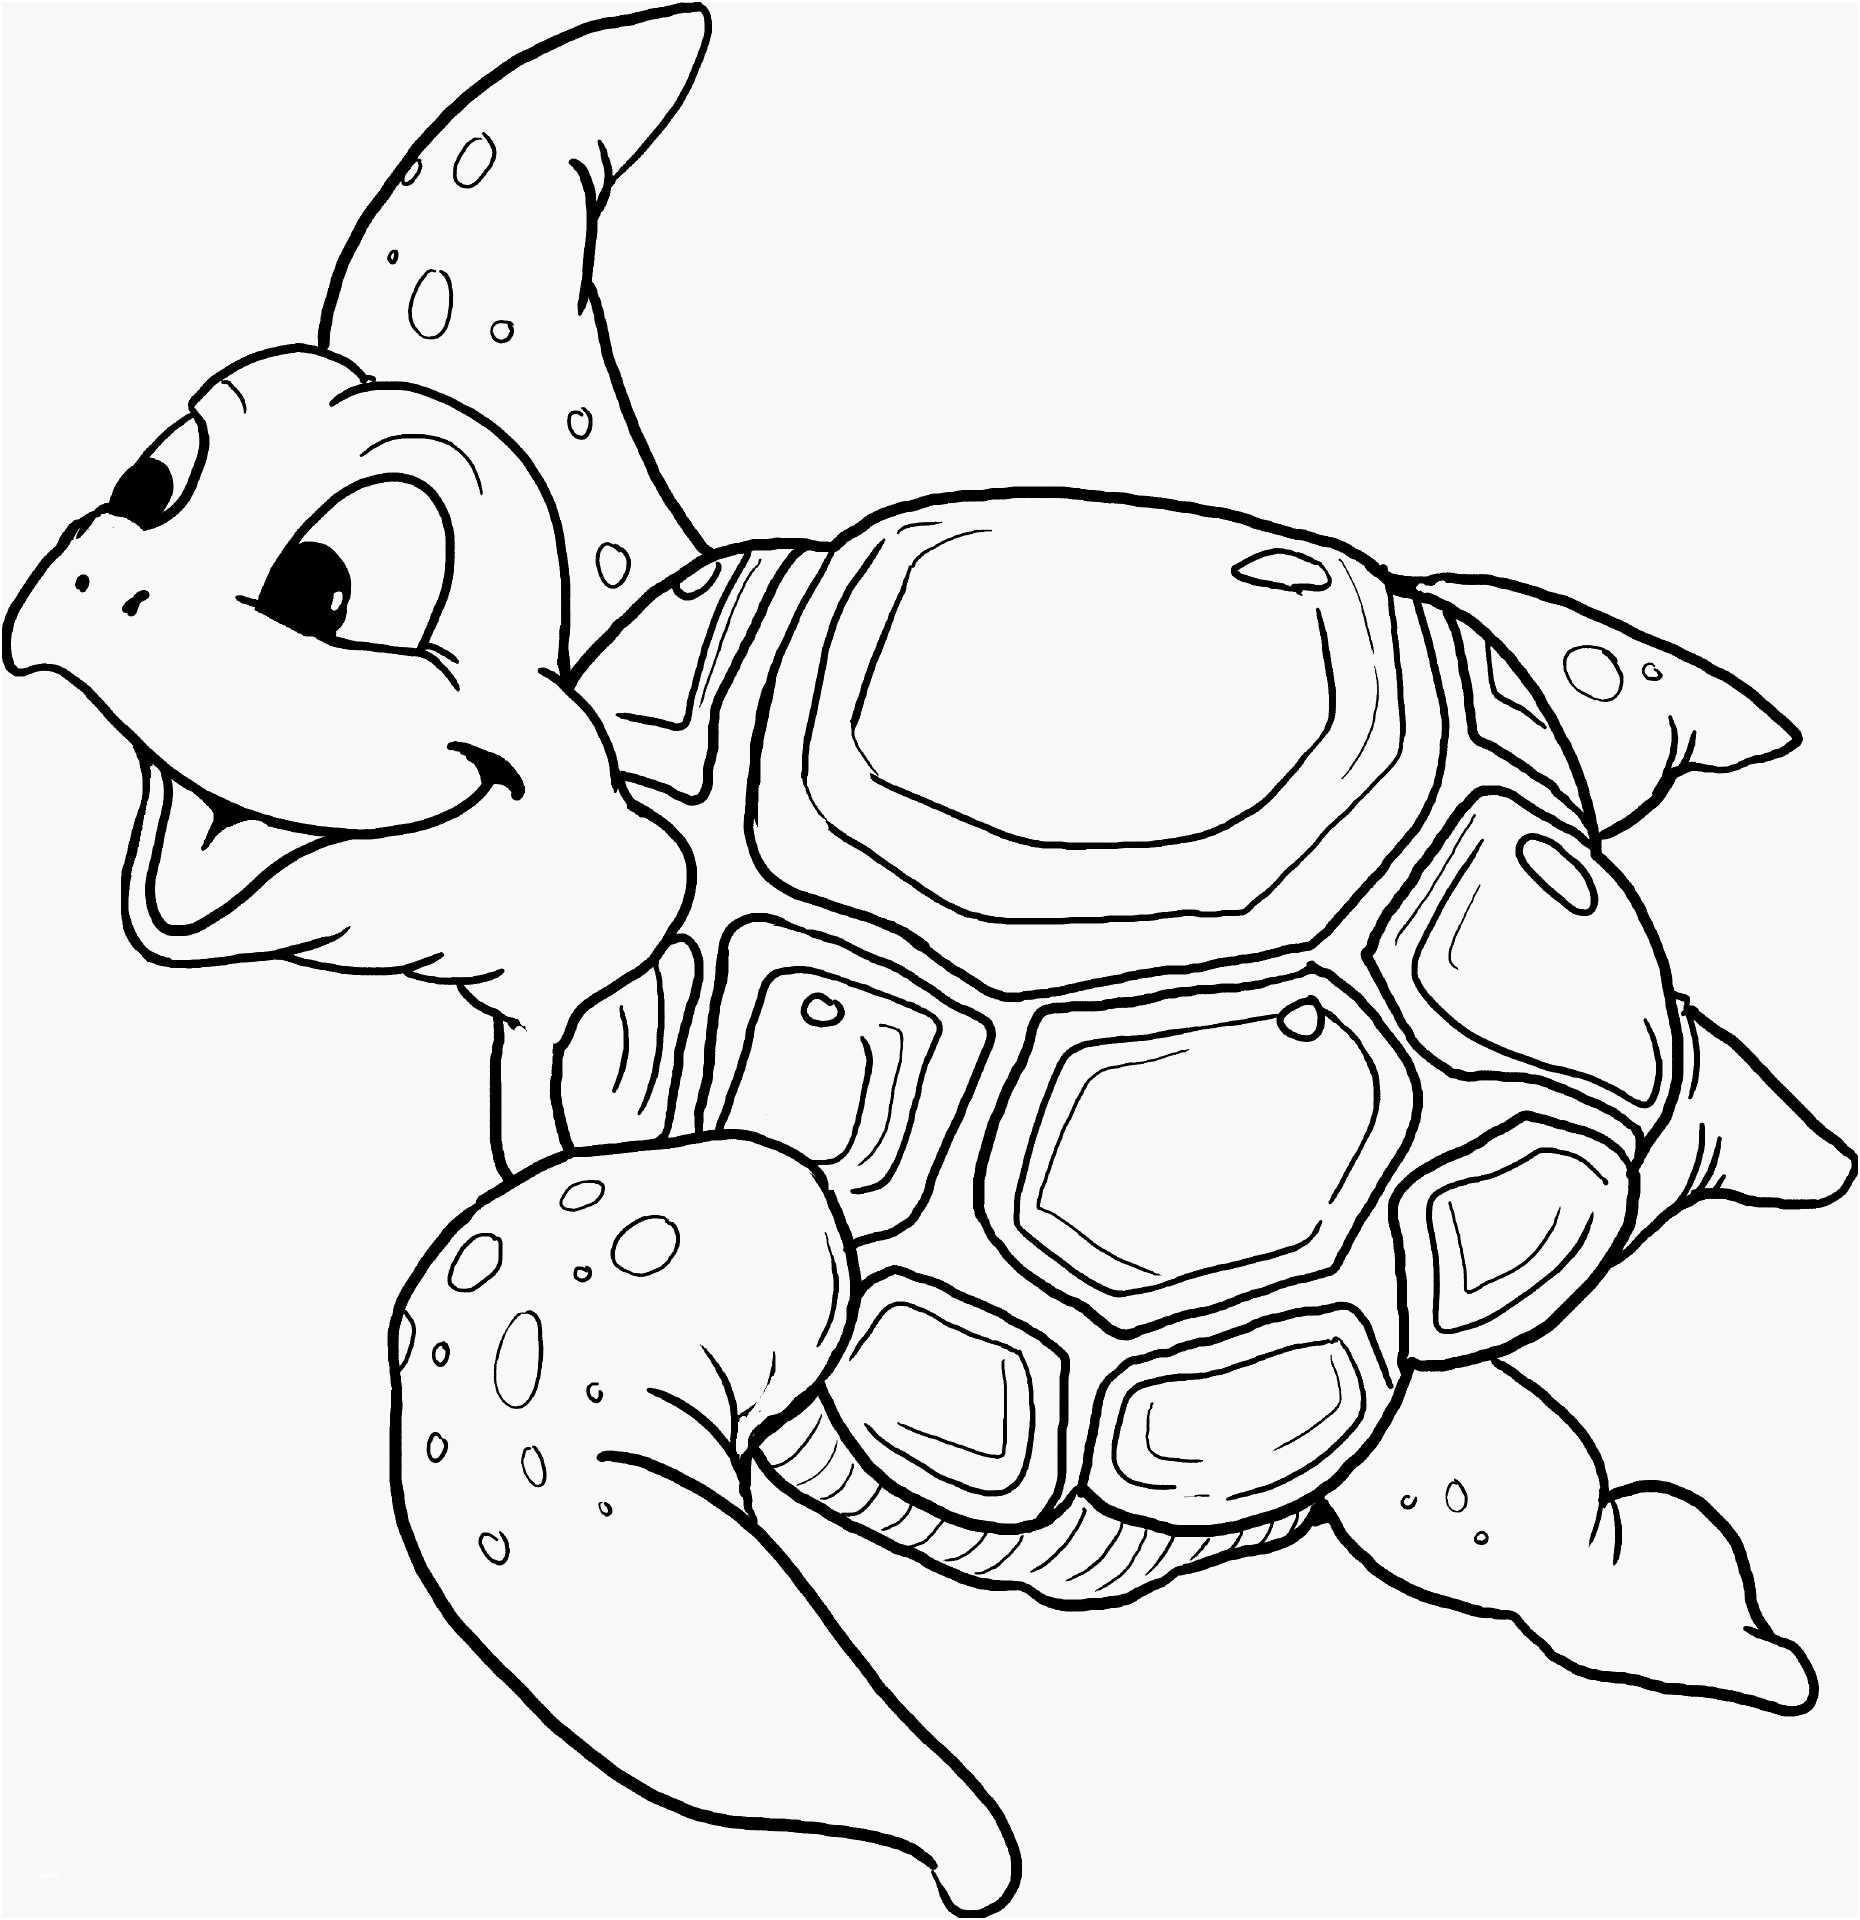 Ninja Turtle Ausmalbilder Genial Teenage Mutant Ninja Turtles Legends Gameplay Walkthrough Part 1 Fotografieren